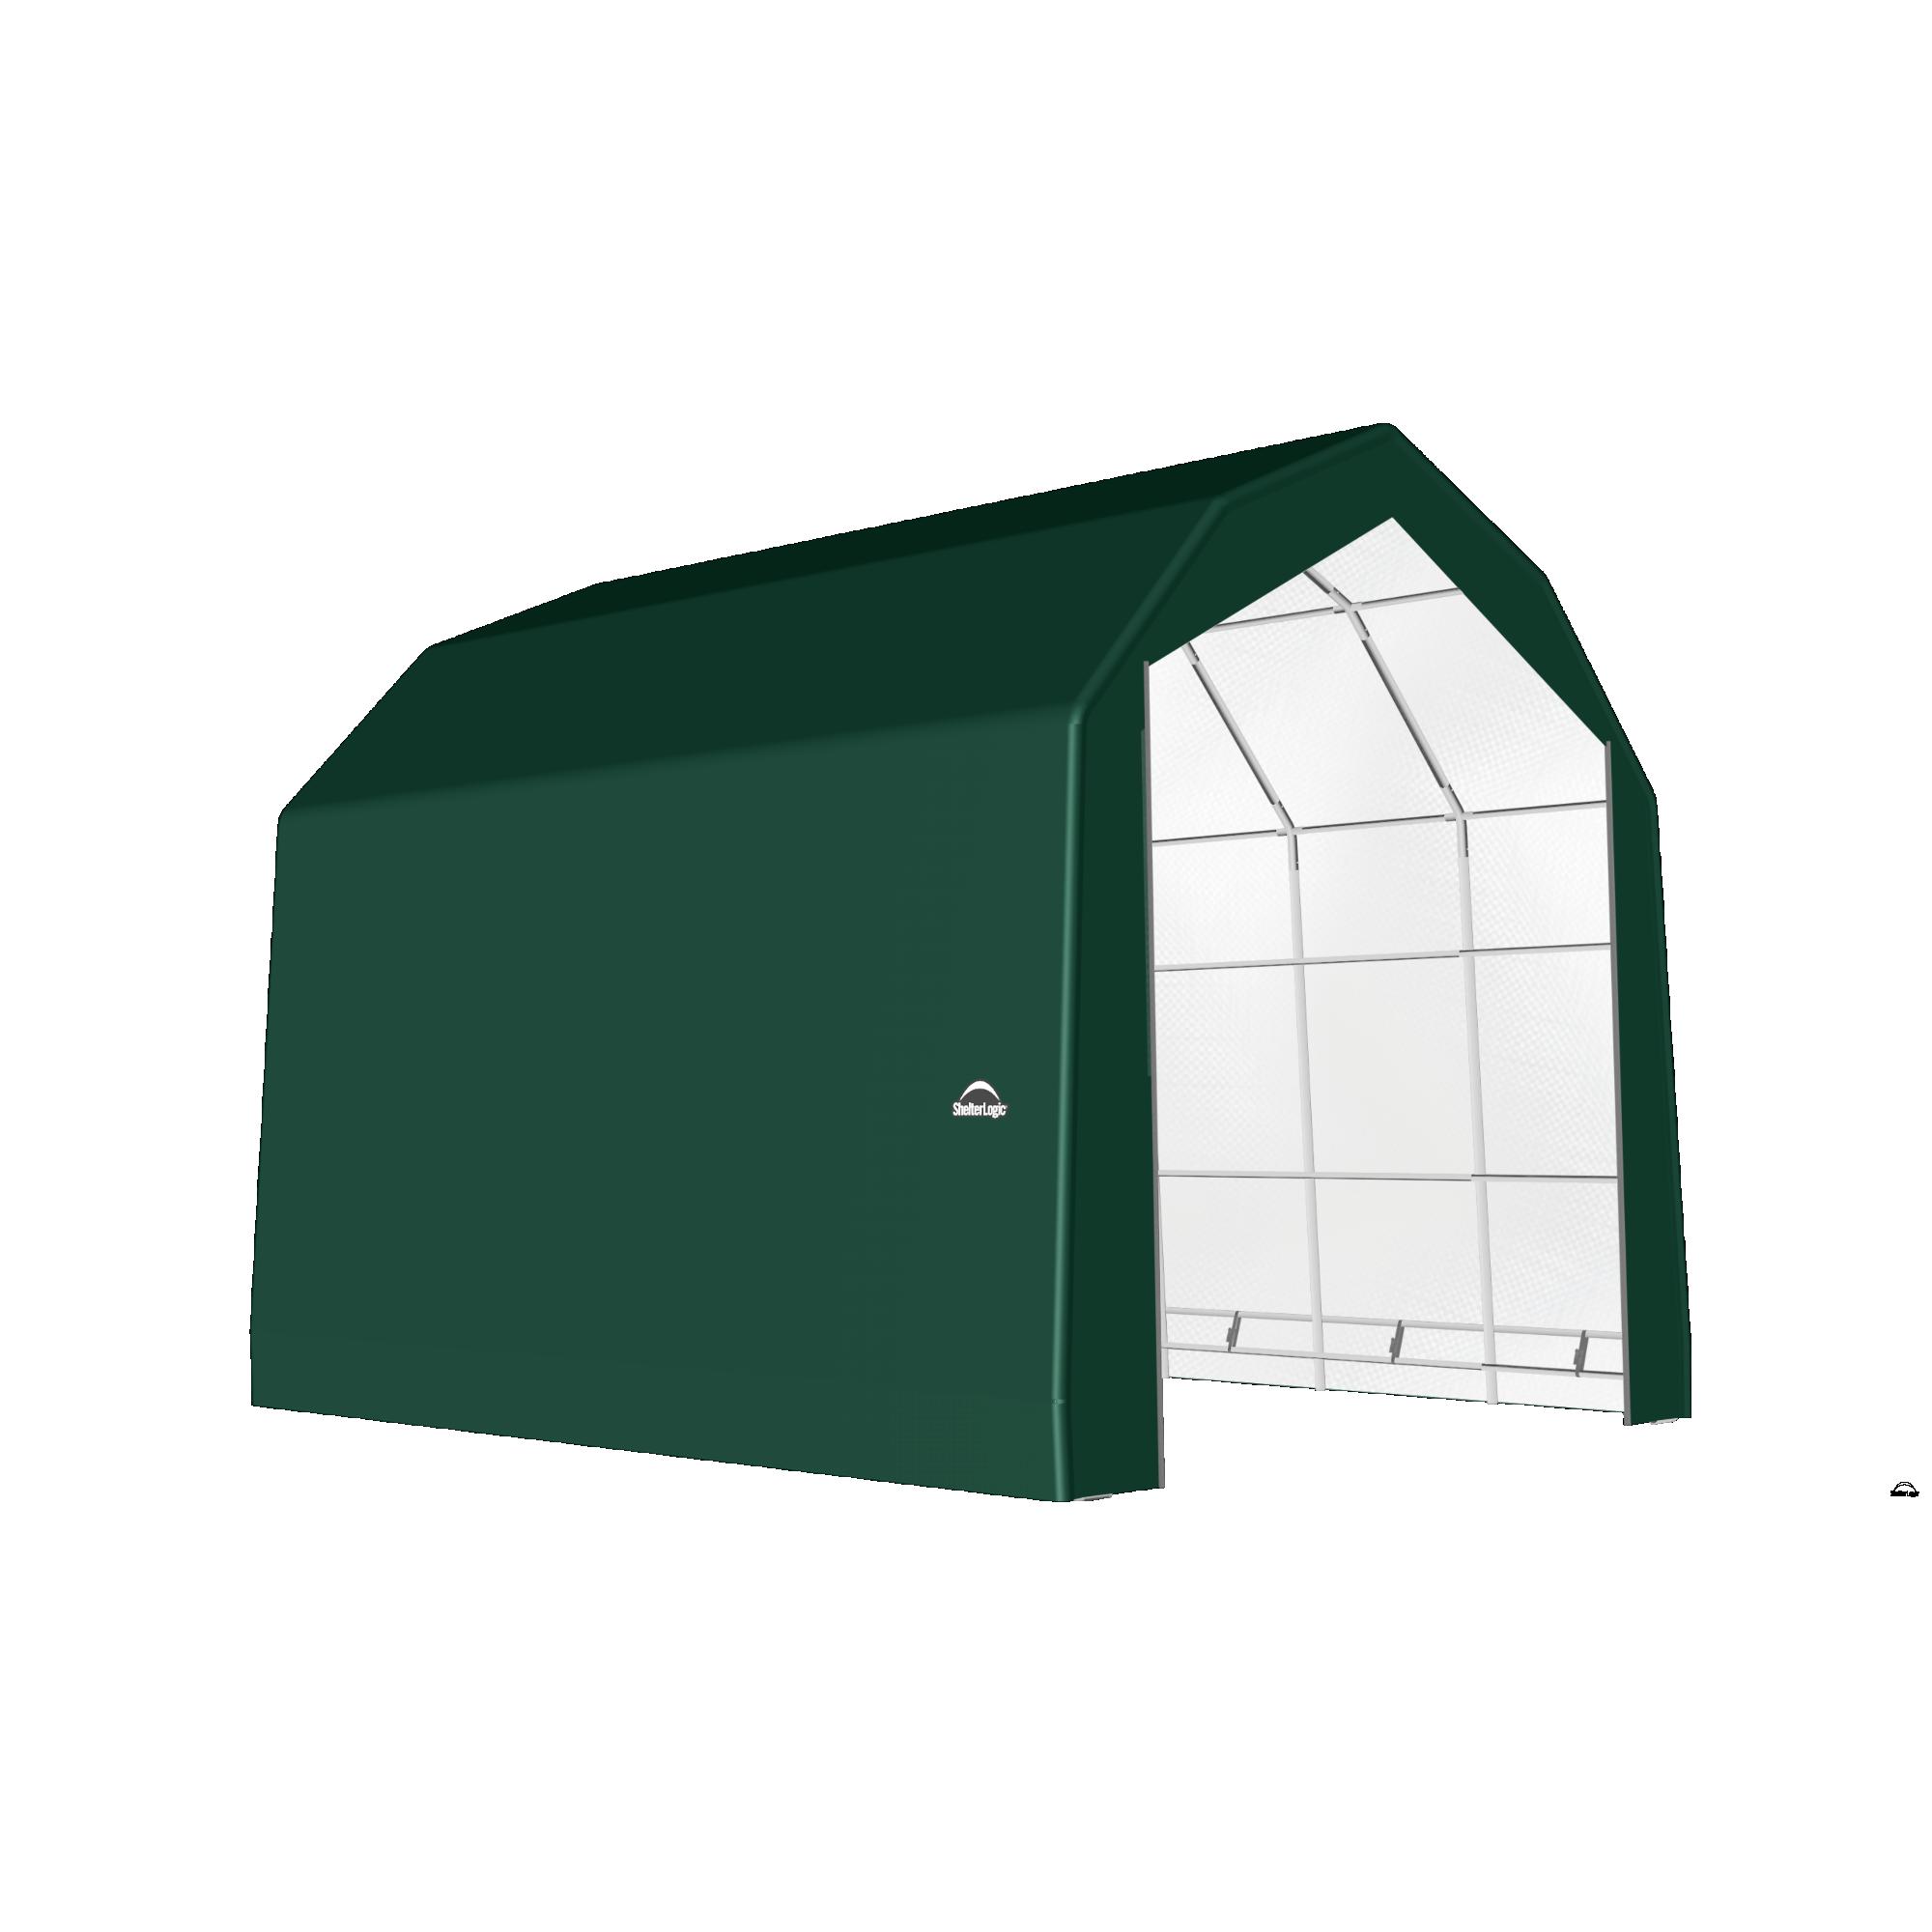 SP Barn 20X20X18 Green 14 oz PE Shelter